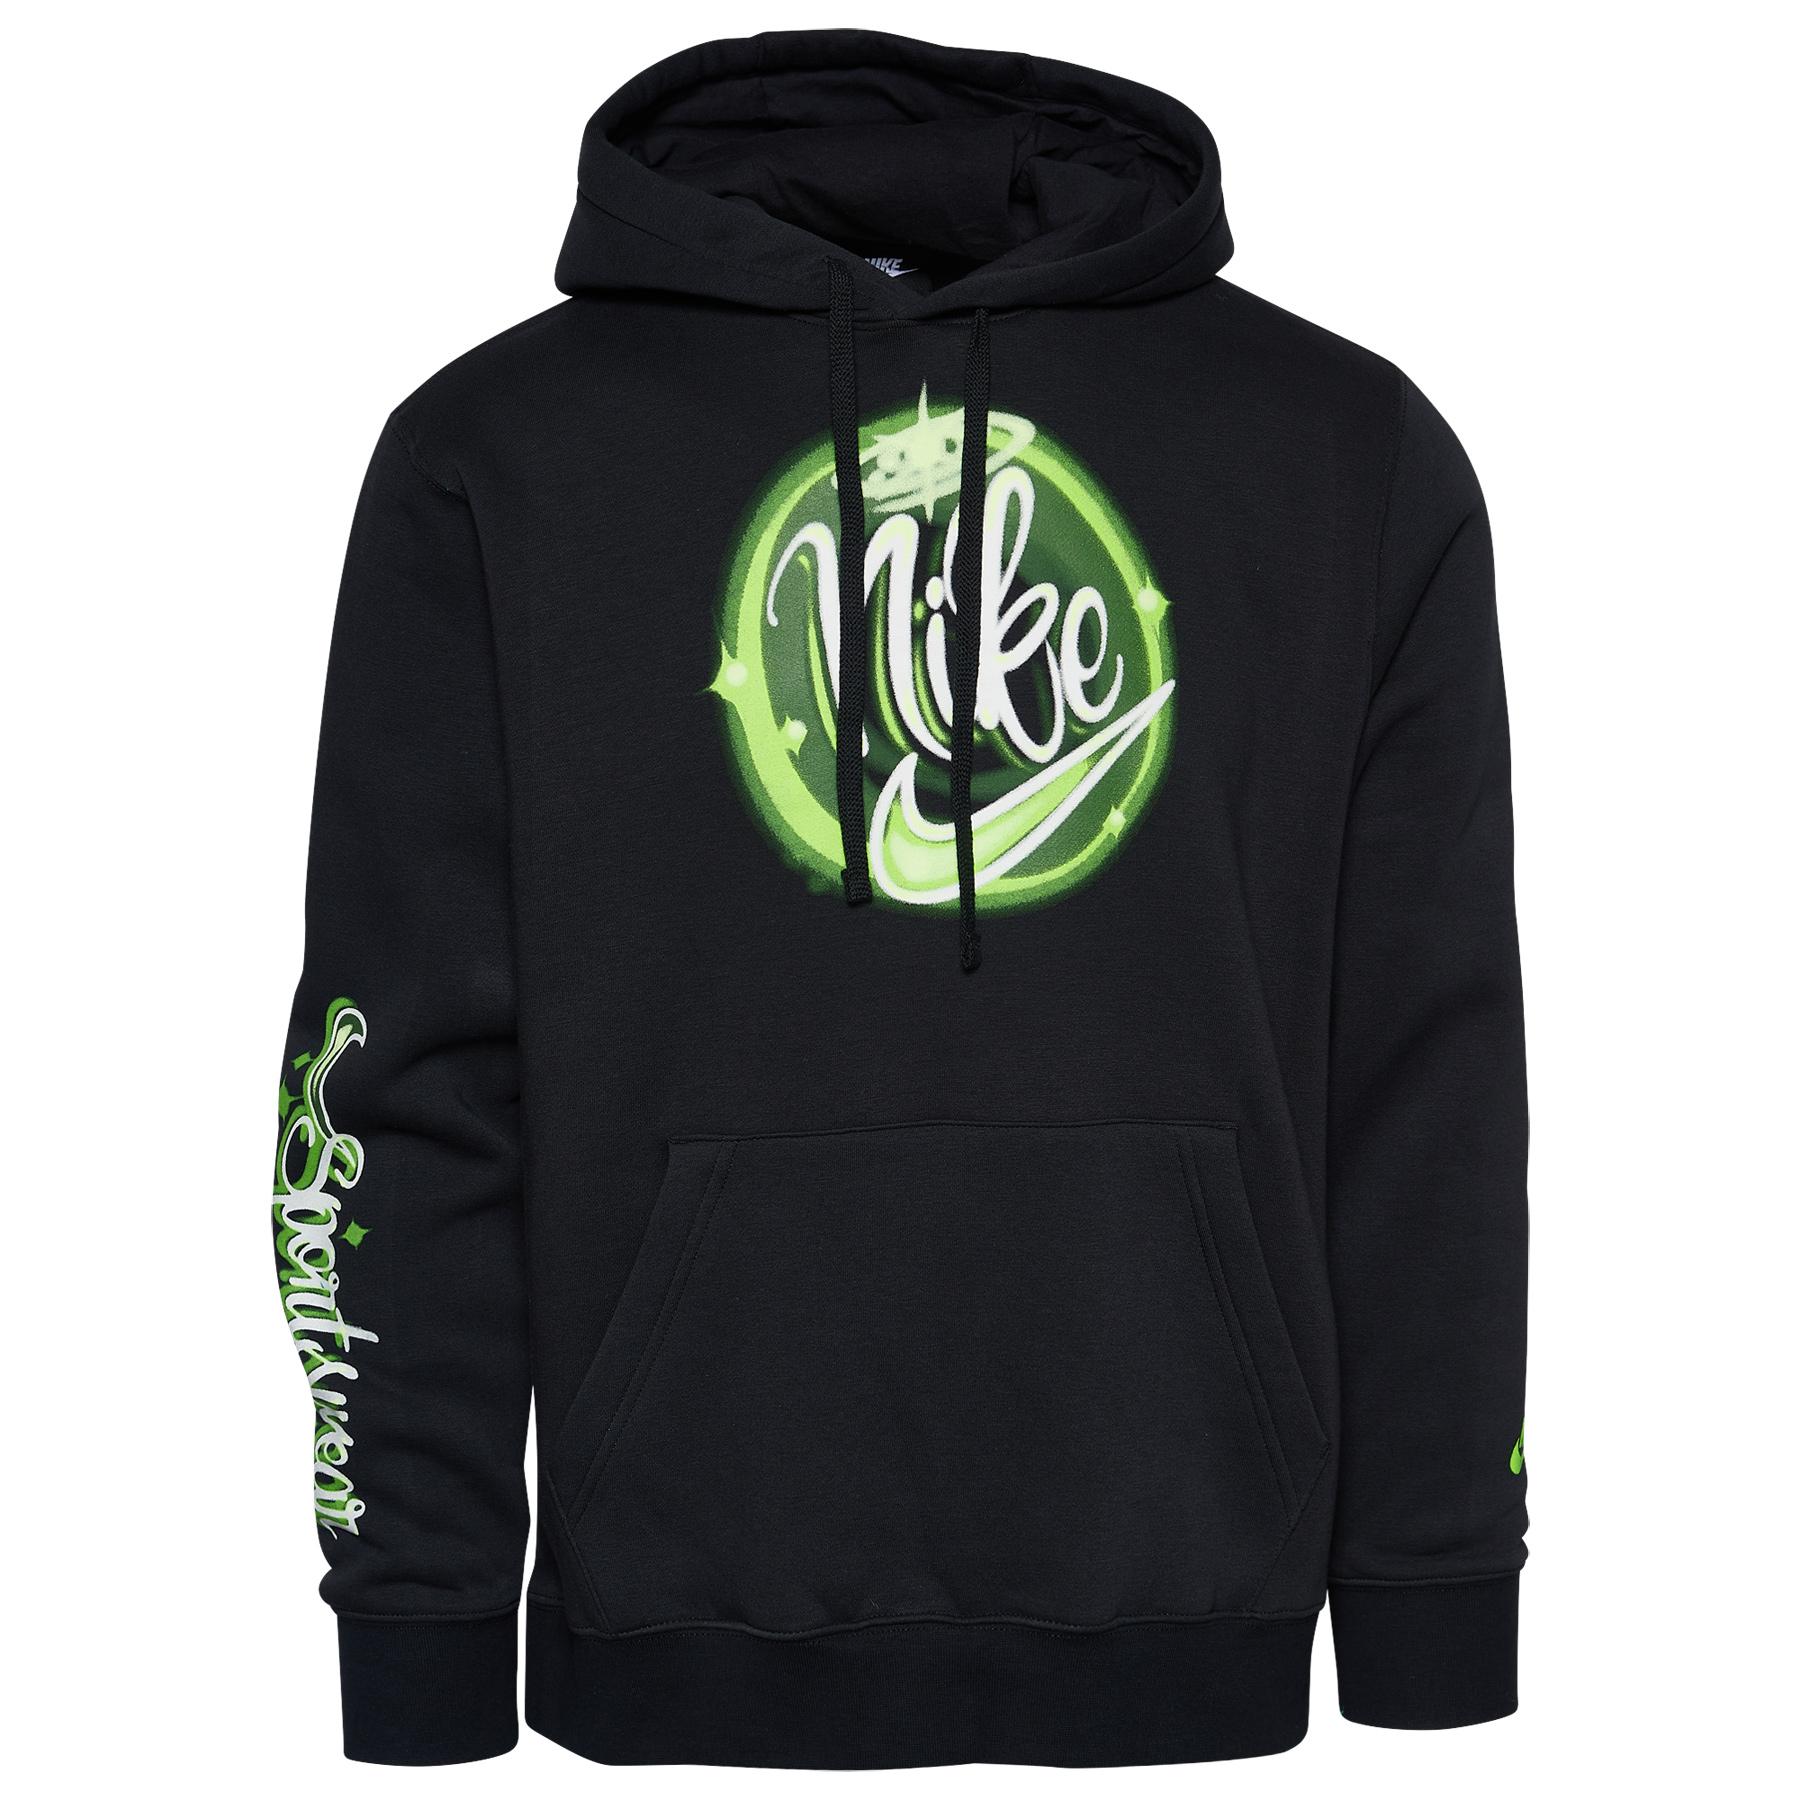 jordan-6-electric-green-nike-hoodie-match-1